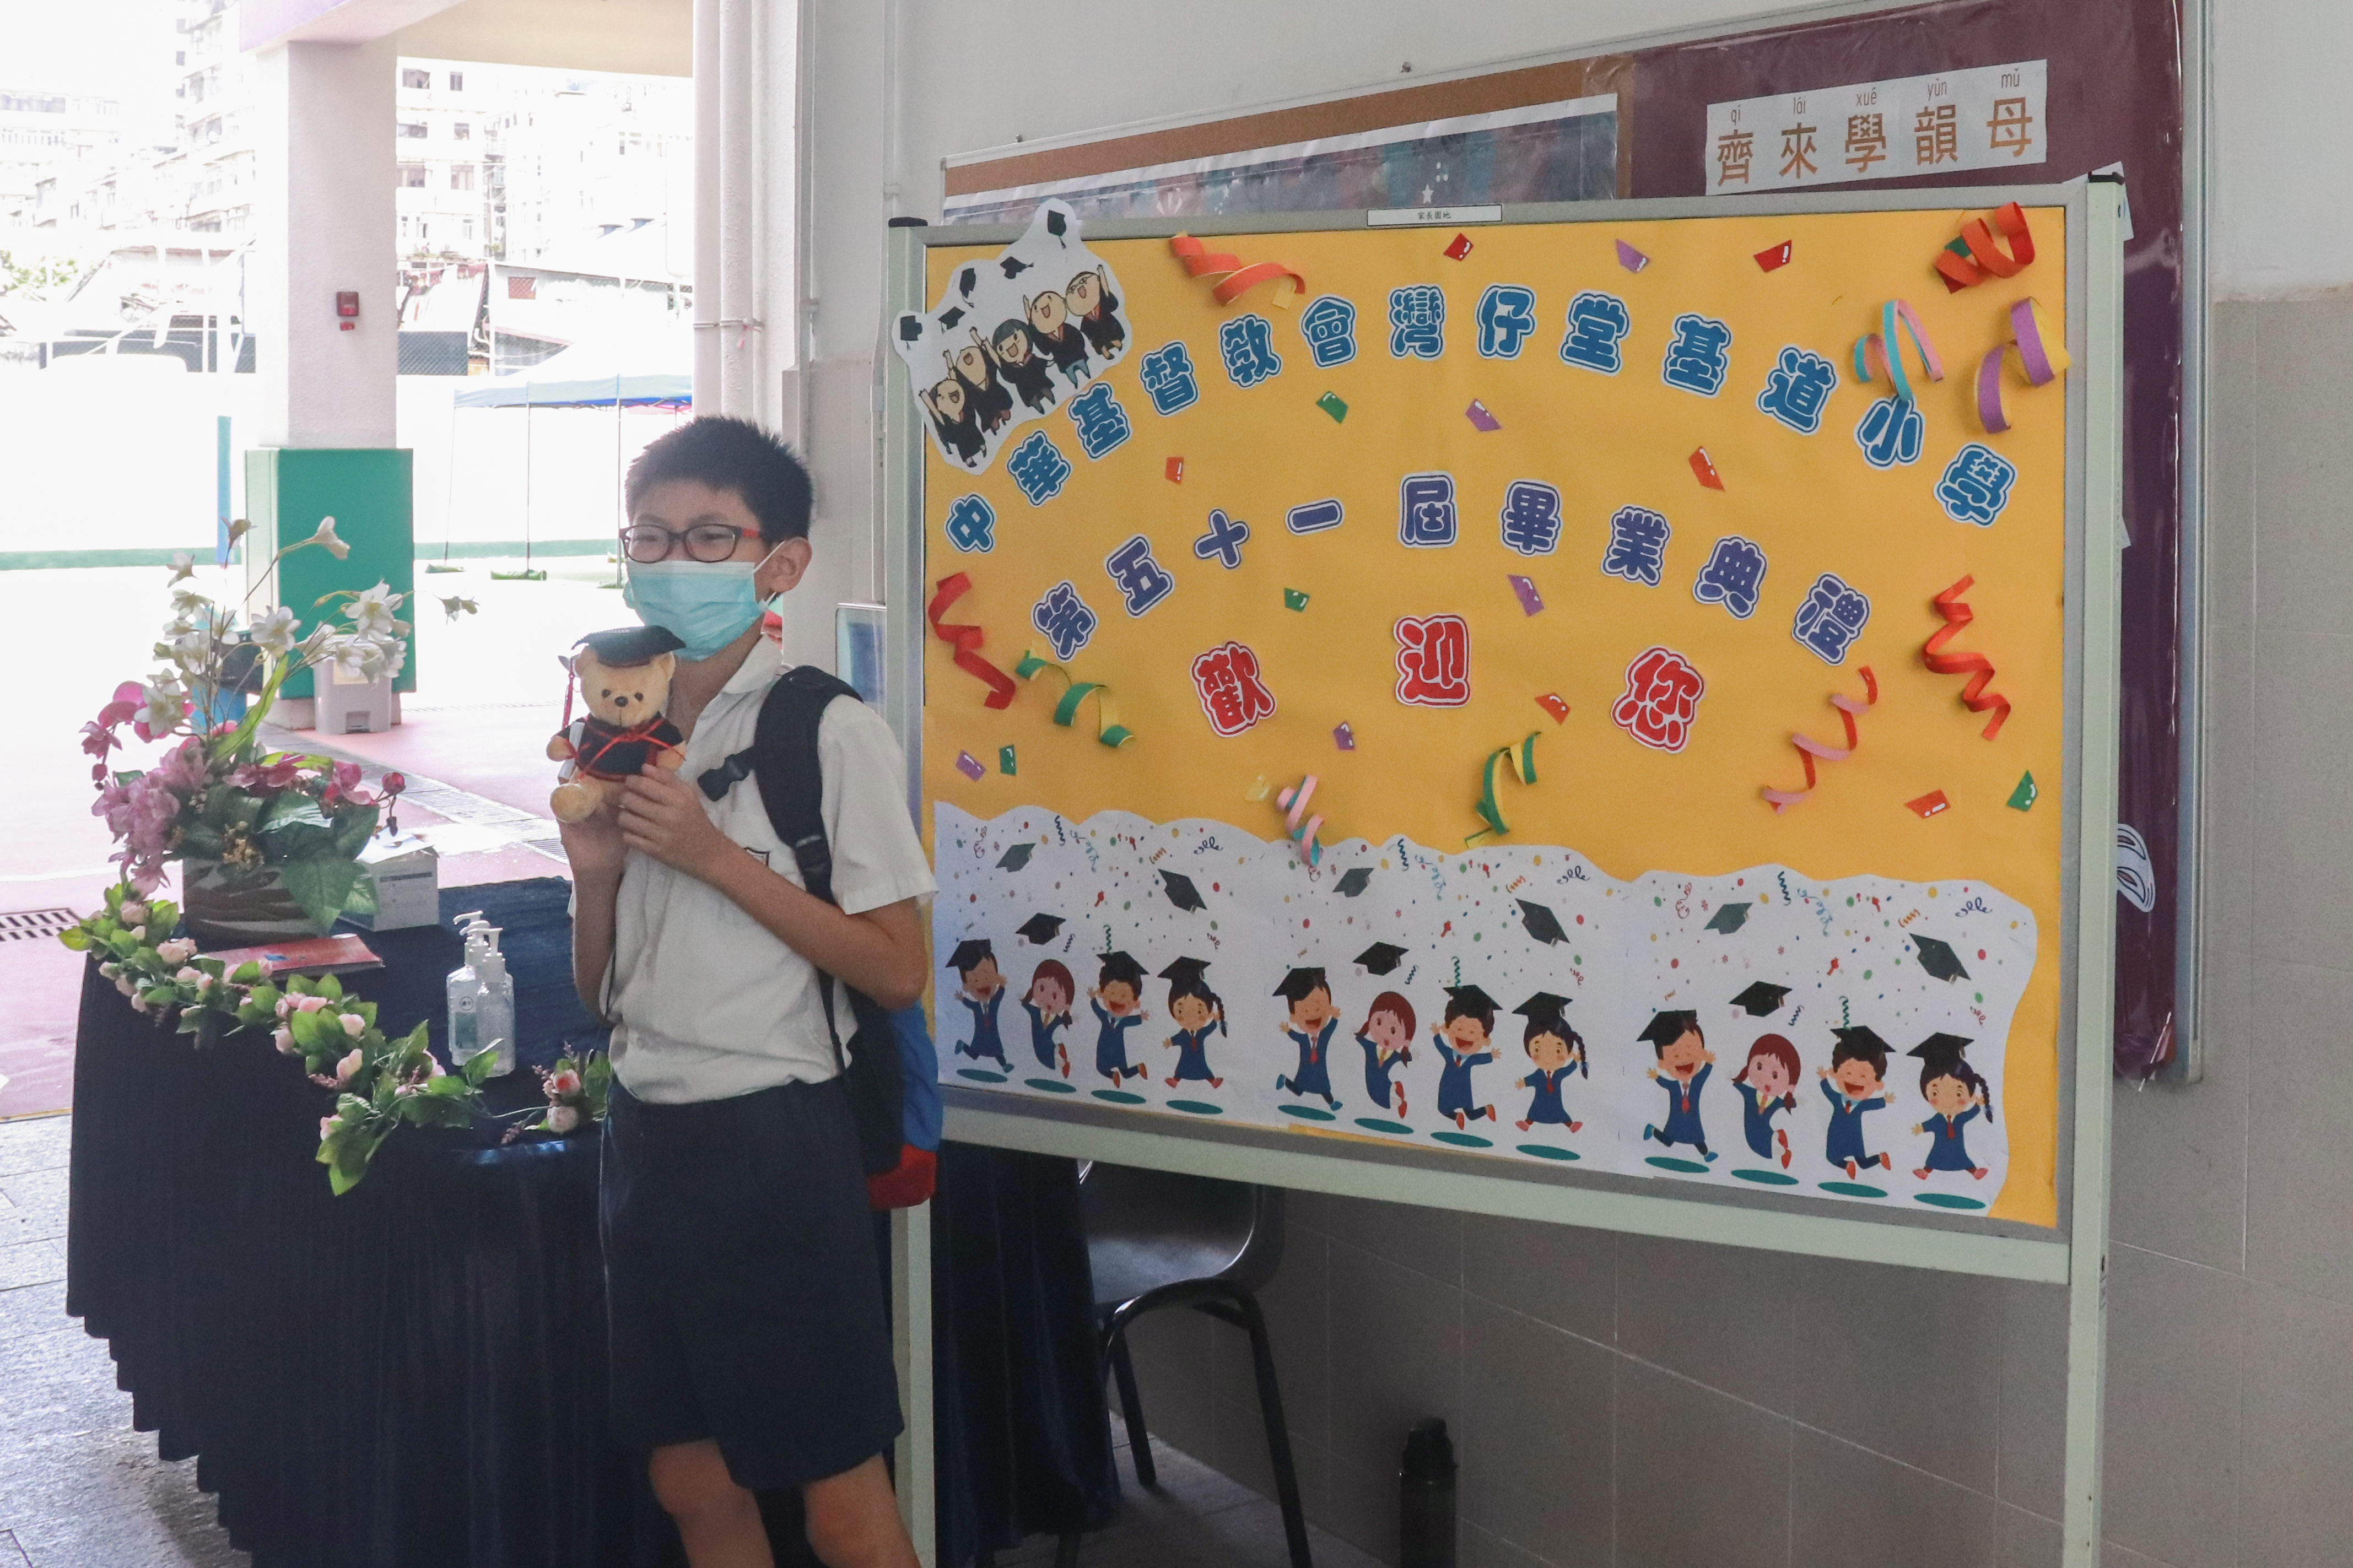 http://keito.school.hk/sites/default/files/img_6016.jpg